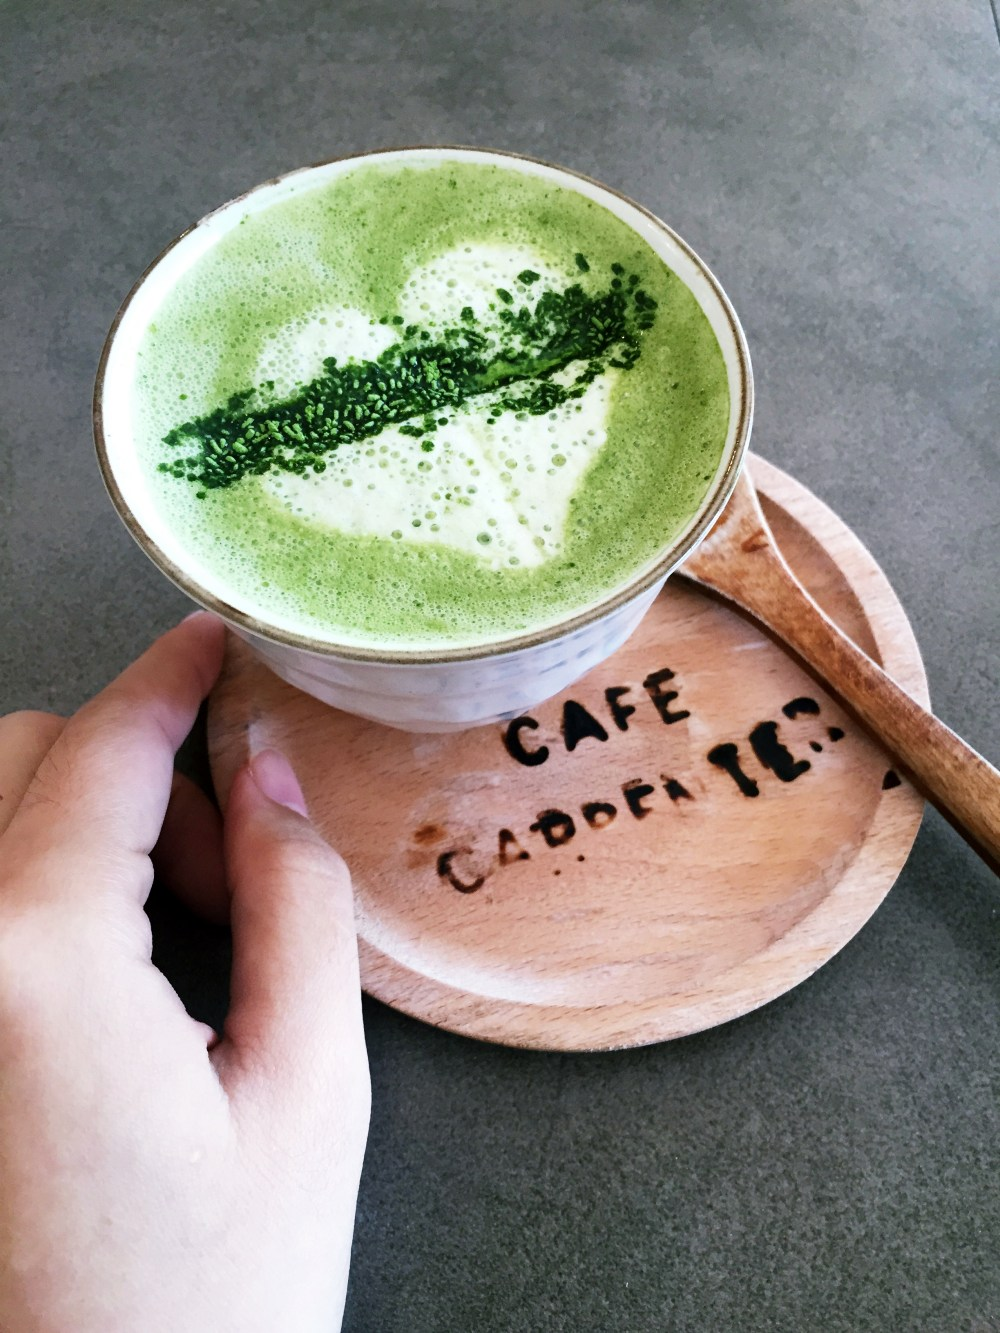 28 June 2016: Cafe Carpenter | Malvern East, Victoria